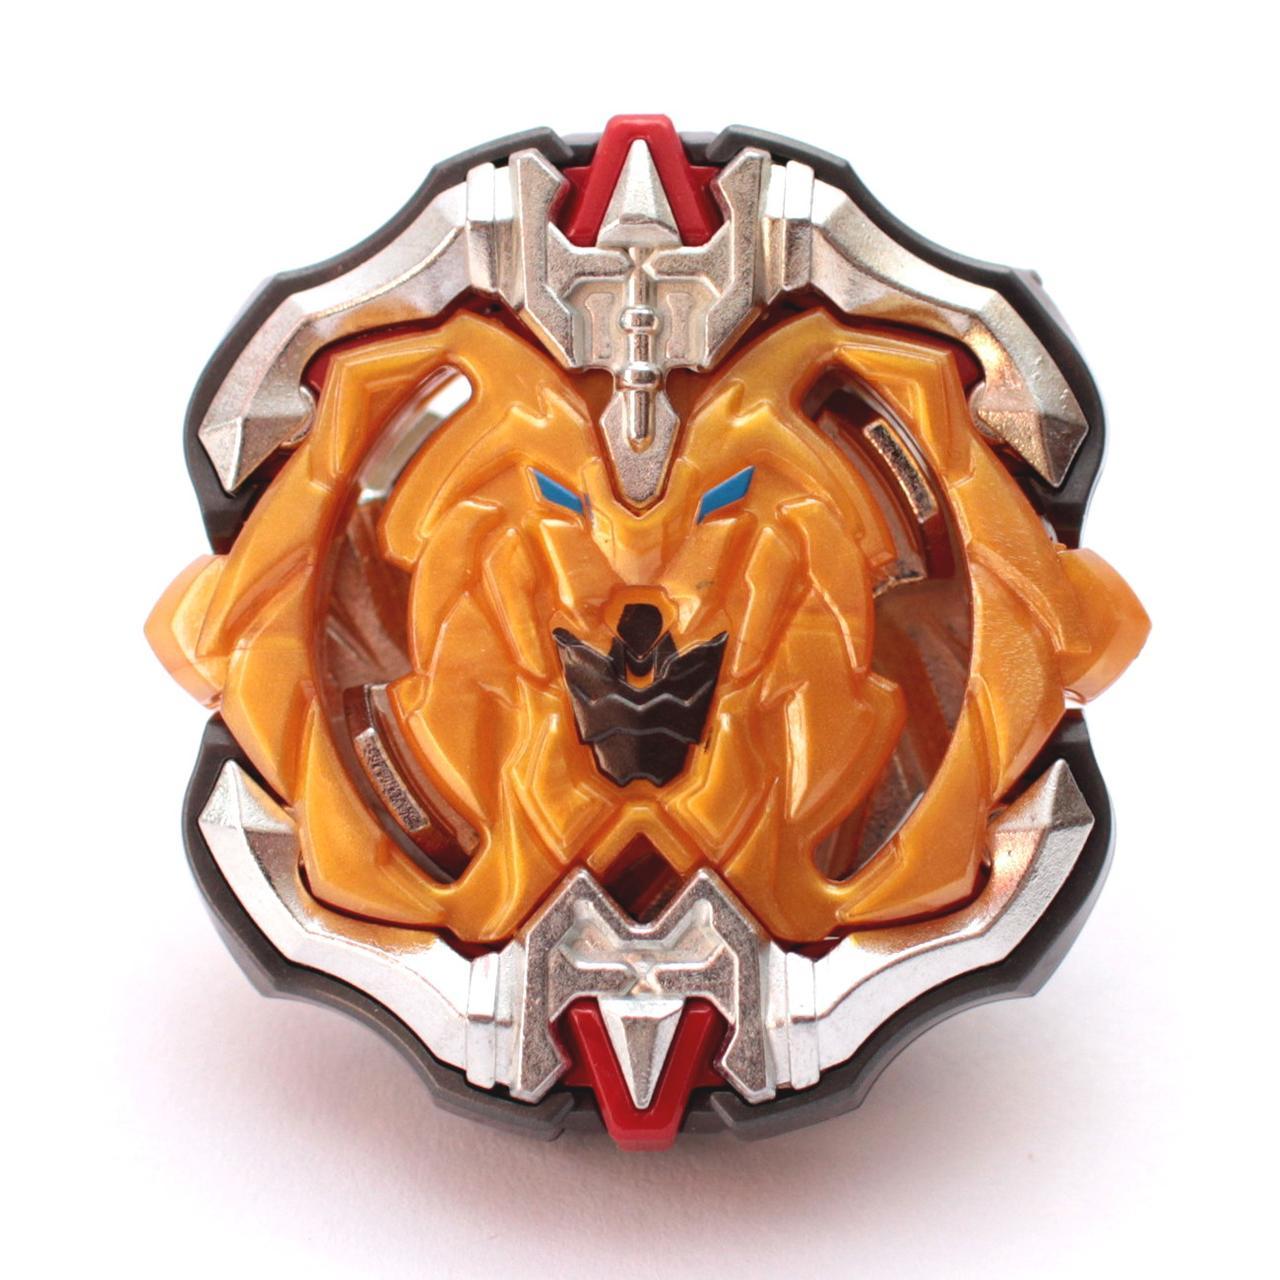 Волчок Бейблэйд Лучник Геркулес (Бейблейд 4 сезон), Beyblade Archer Hercules (Beyblade, SB™)